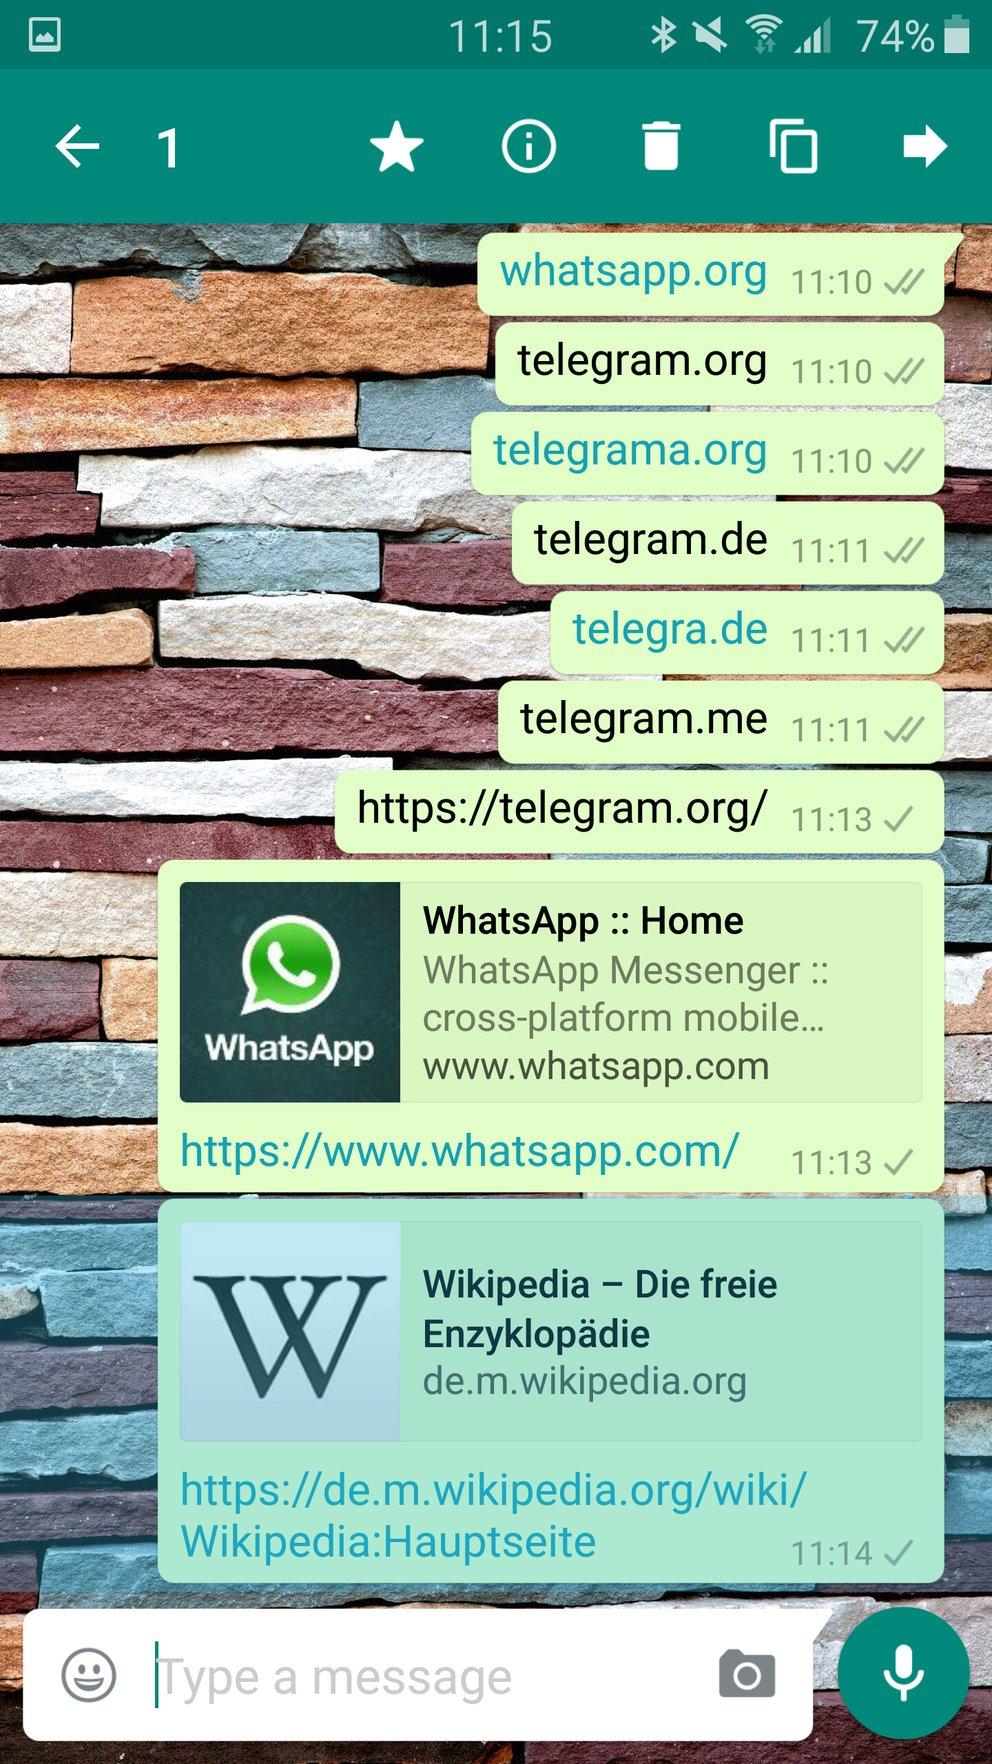 whatsapp-telegram-zensur-screenshot-3